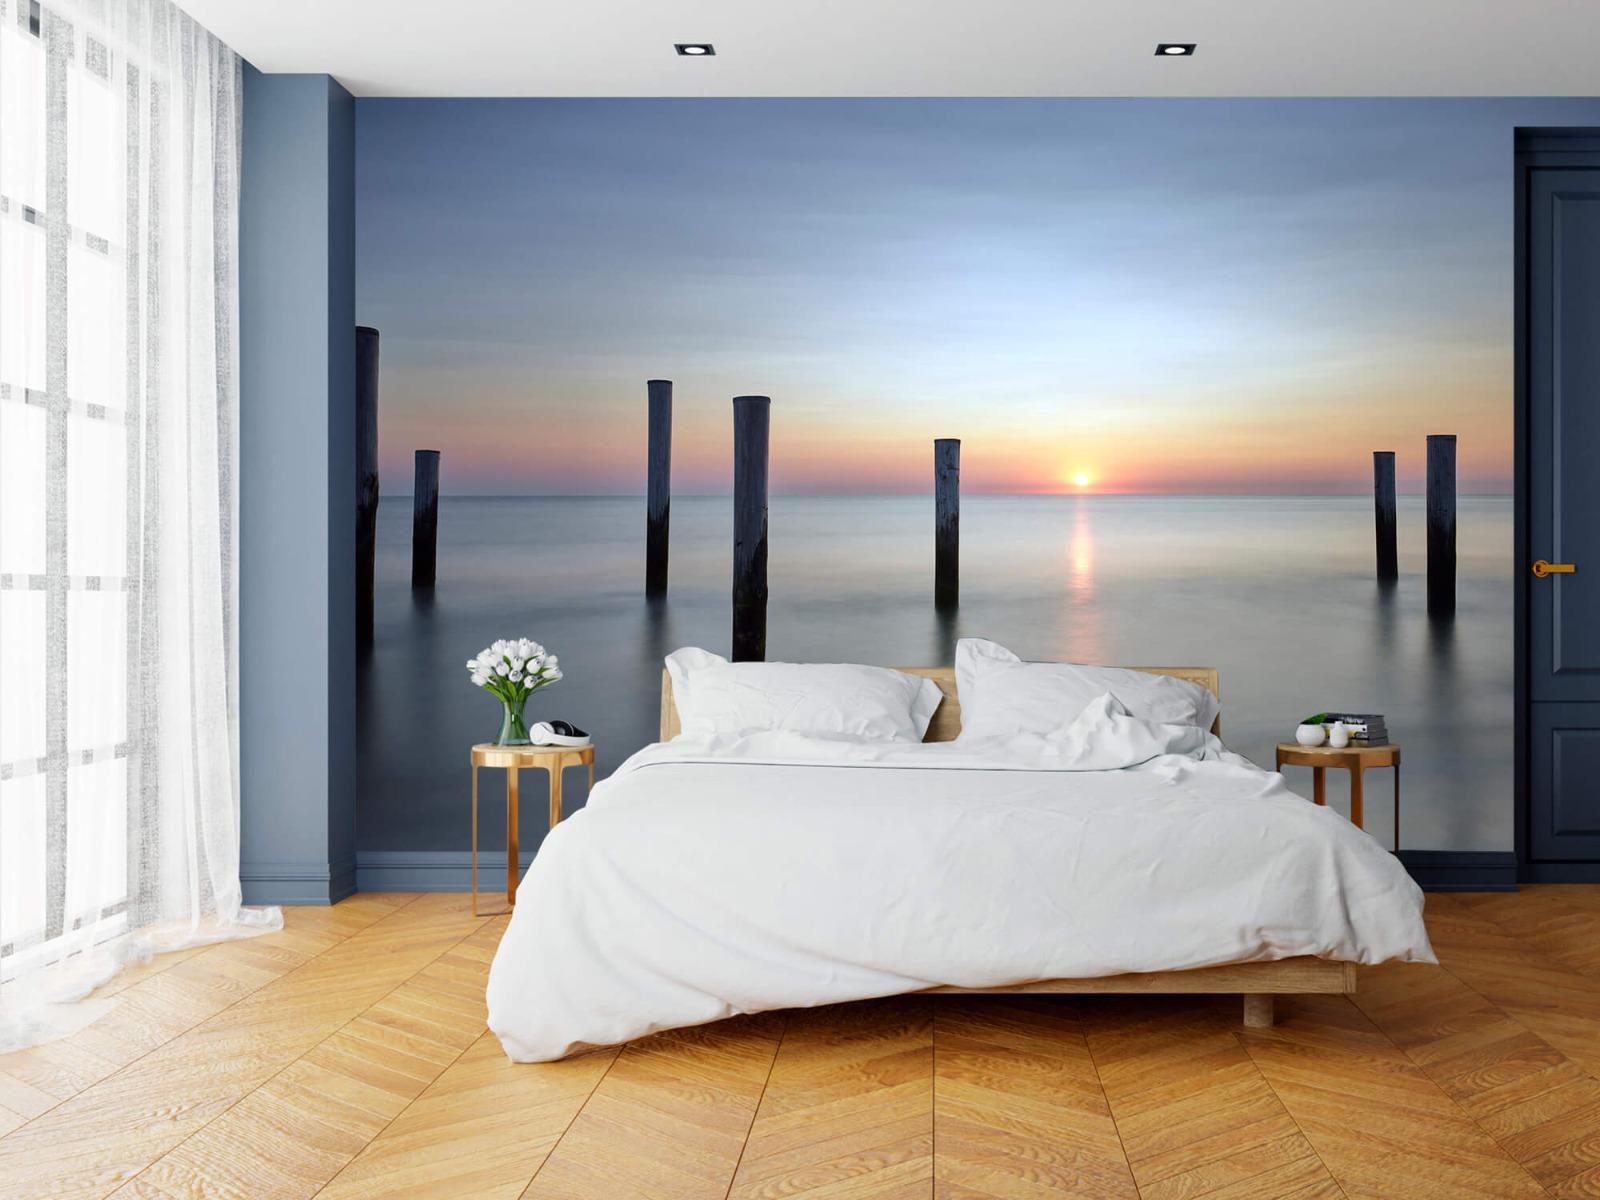 Zeeën en Oceanen - Strandpalen - Slaapkamer 19